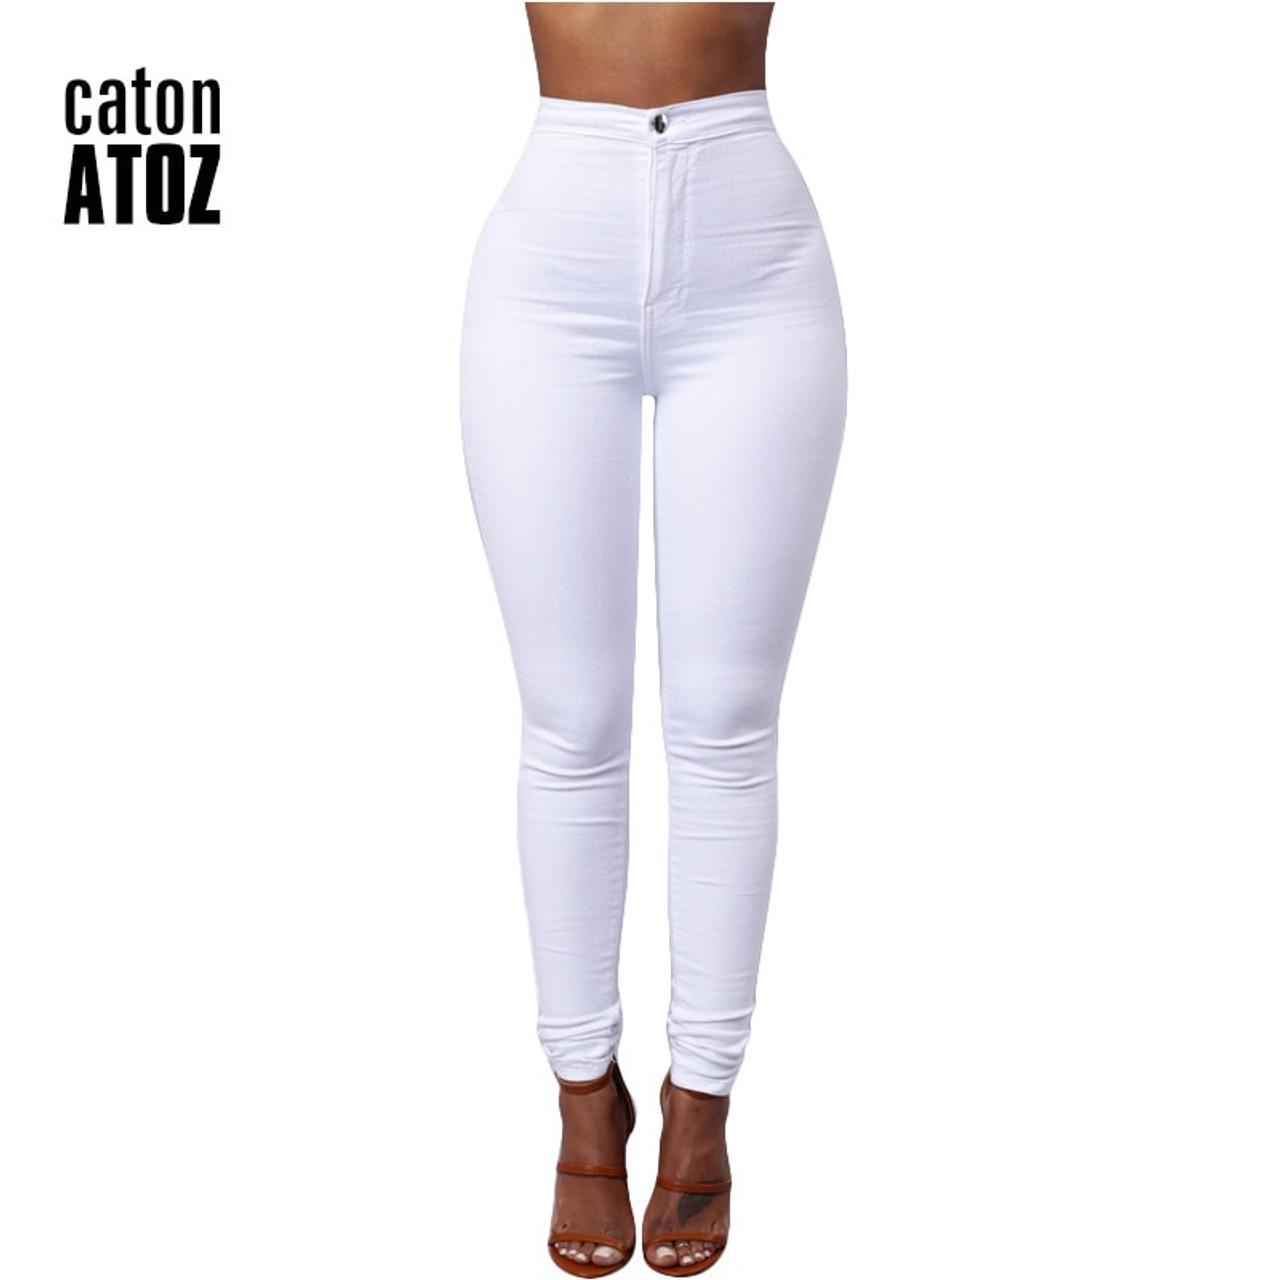 62ca3086f54108 catonATOZ 1888 New Women's High Waist Jeans Pencil Stretch Denim Pants  Female Slim Skinny Trousers Calca ...